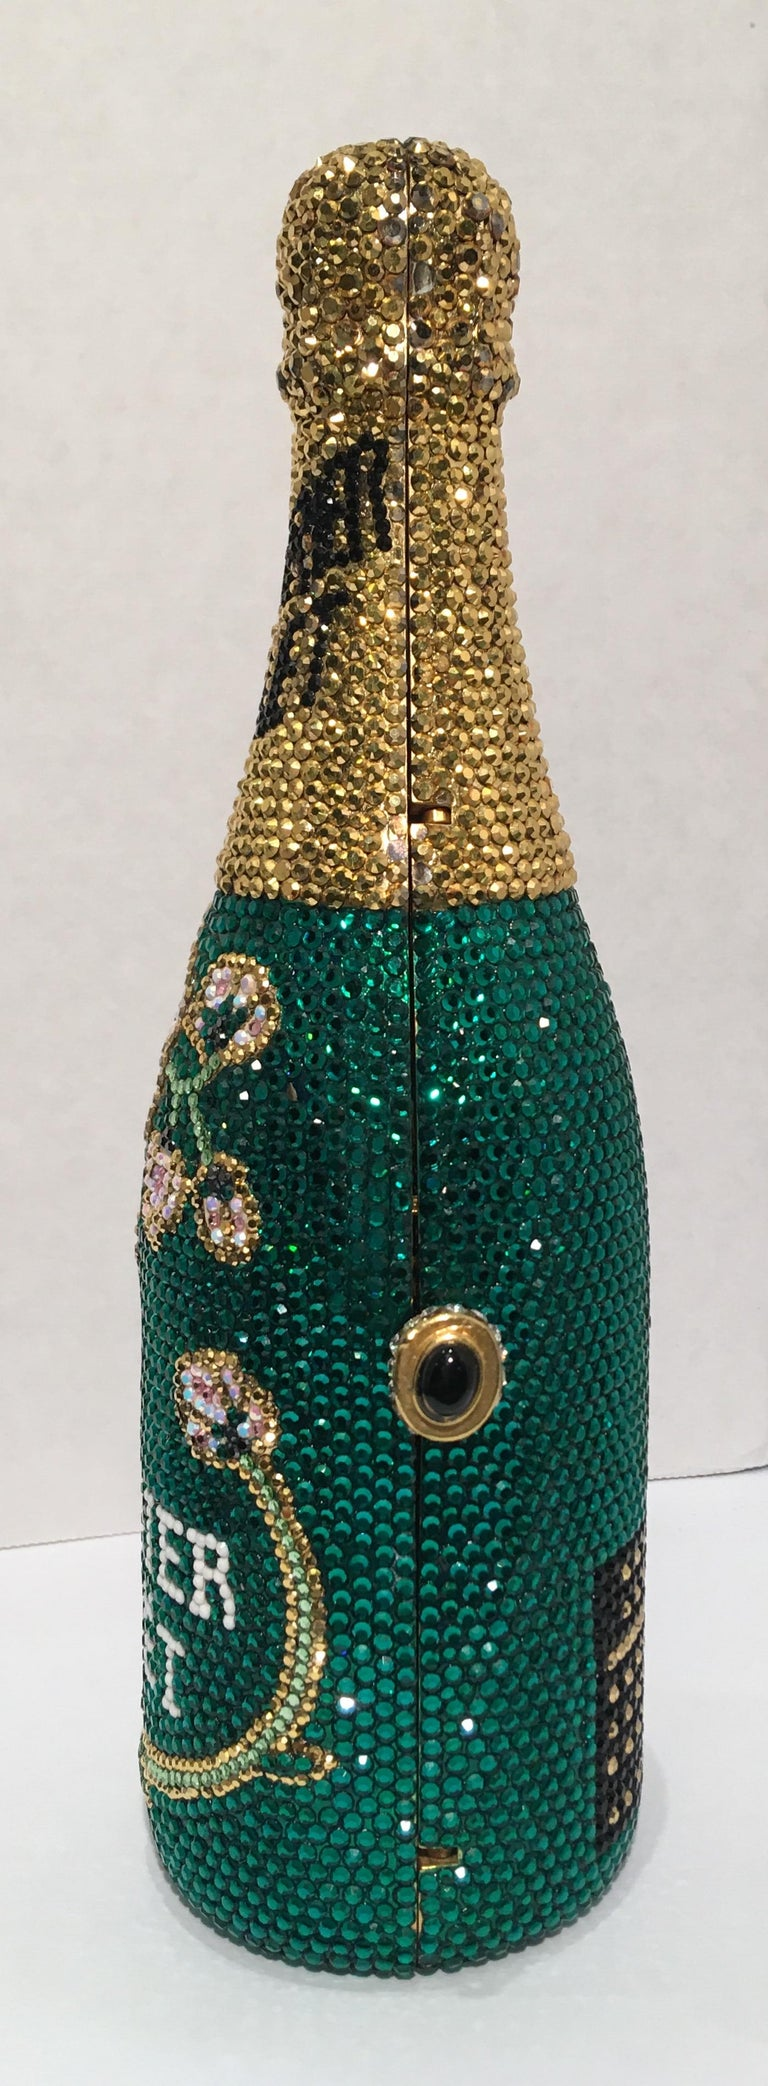 Black Kathrine Baumann Limited Edition Perrier Jouet Bottle Miniaudiere Evening Bag For Sale